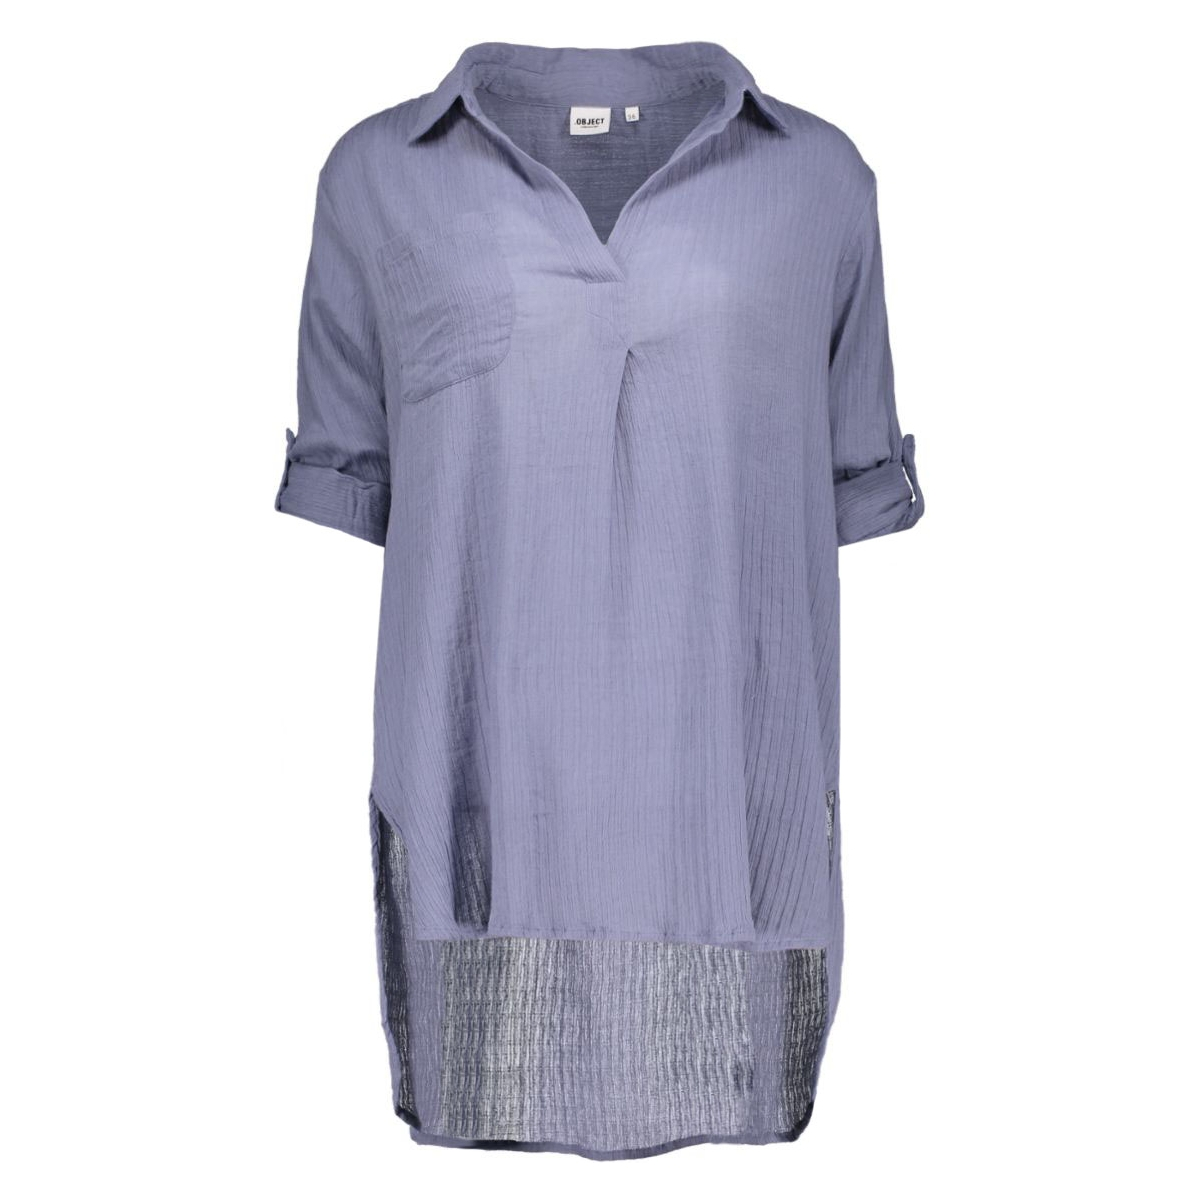 objarizona 3/4 shirt 85 23022350 object blouse stonewash